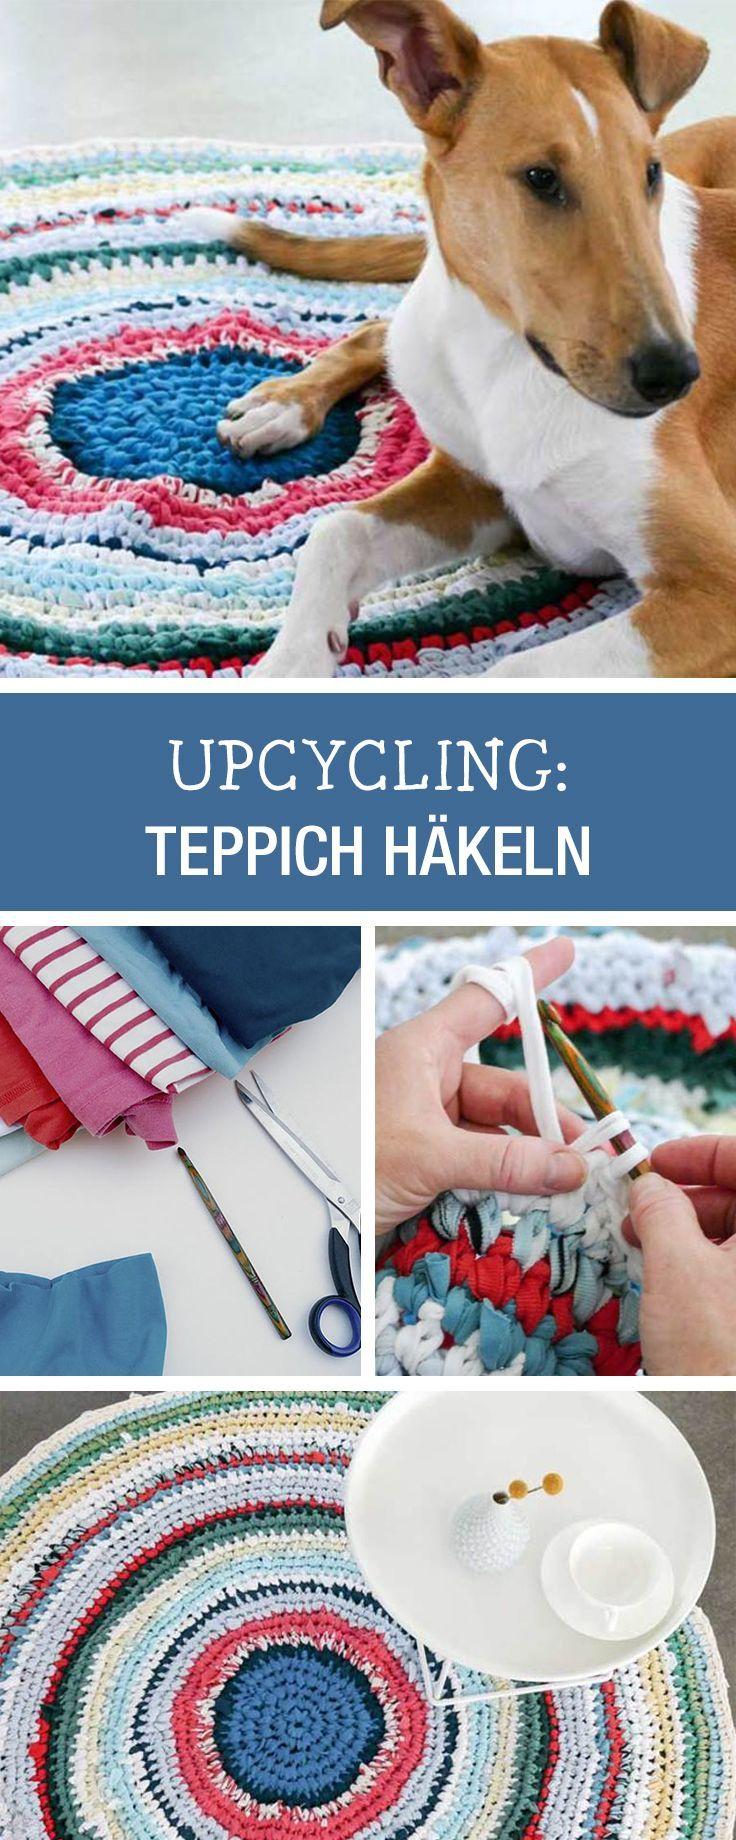 absoluter hingucker h kel dir einen teppich aus textilgarn ideen mit jerseygarn diy crochet. Black Bedroom Furniture Sets. Home Design Ideas